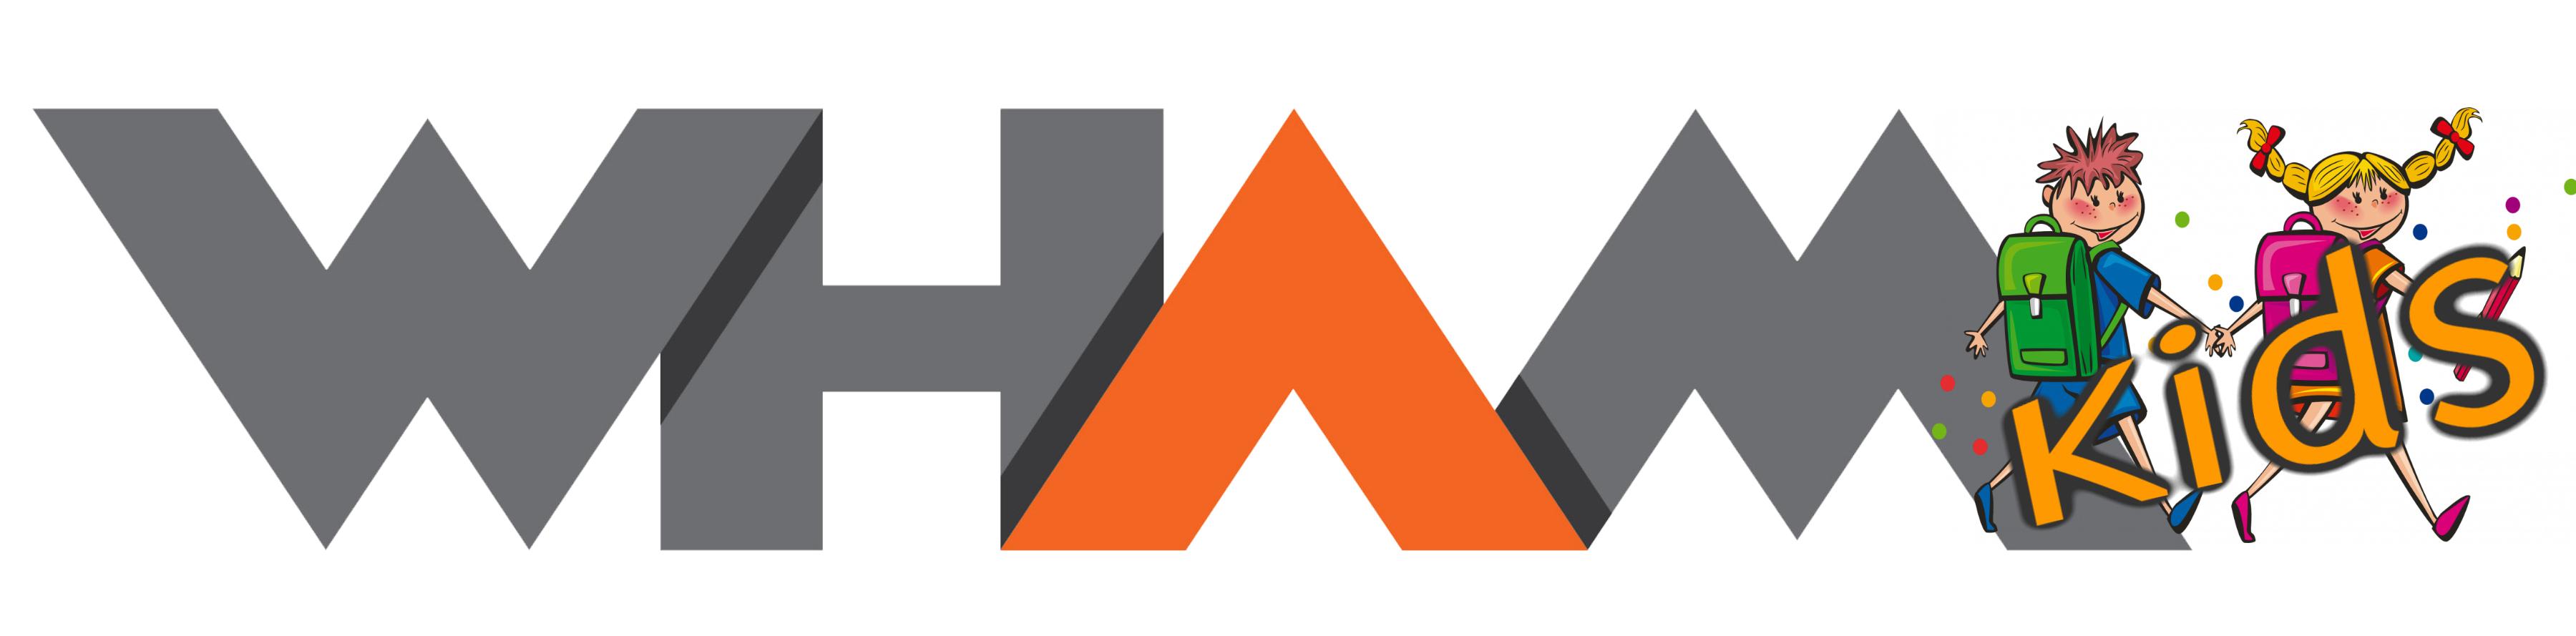 WHAM_Kids_logo